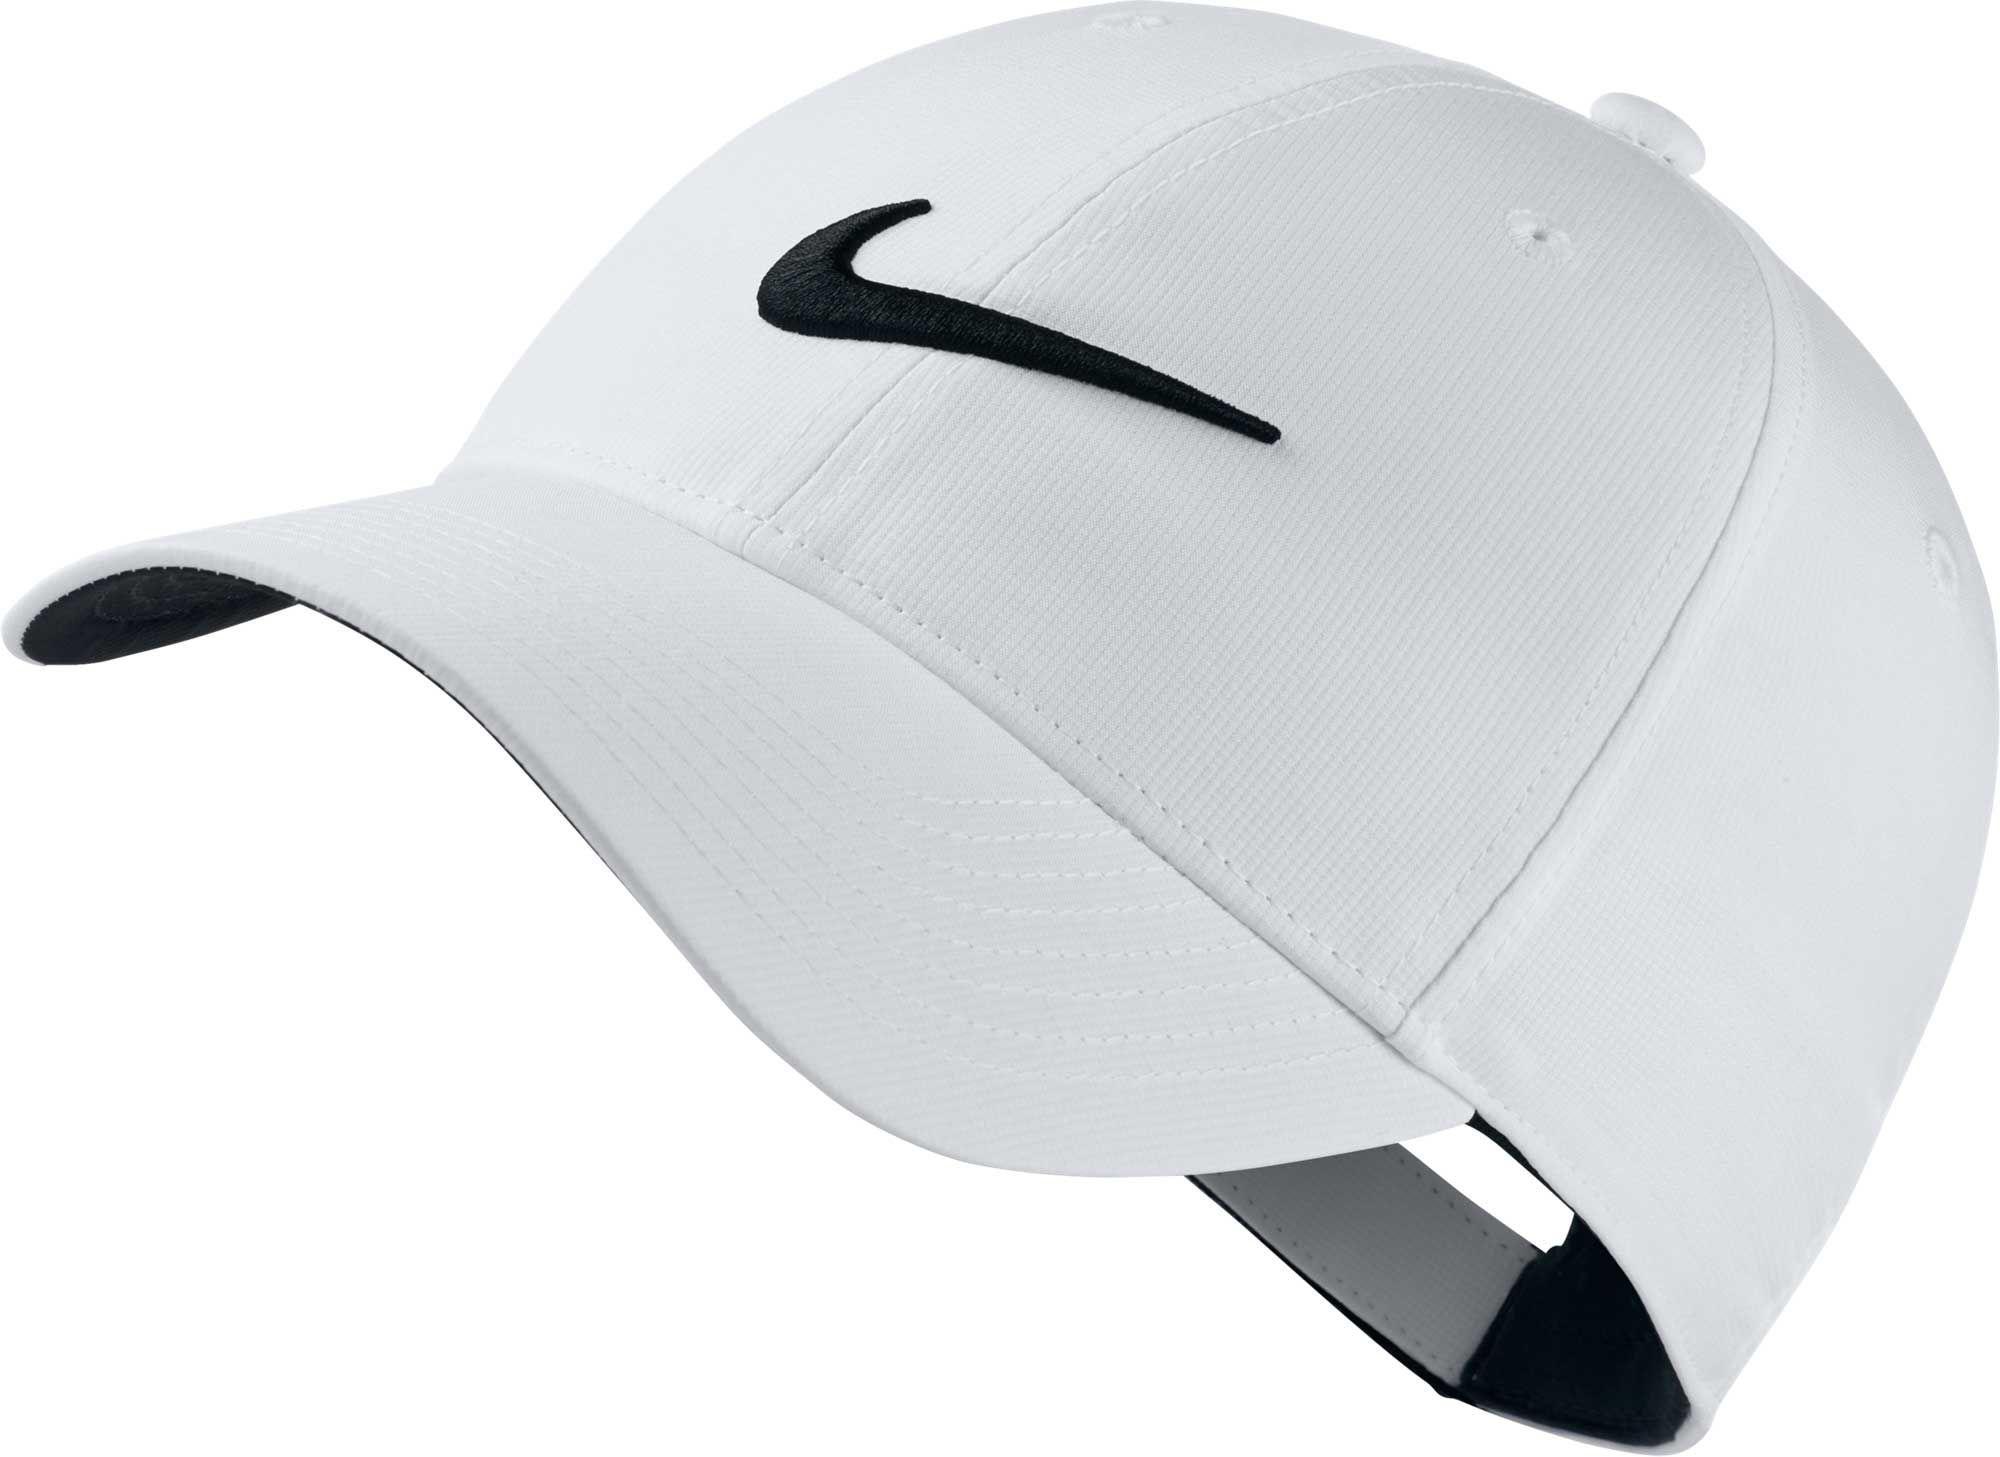 Lyst - Nike 2018 Legacy91 Tech Golf Hat in White for Men 2252c9bcb7f7